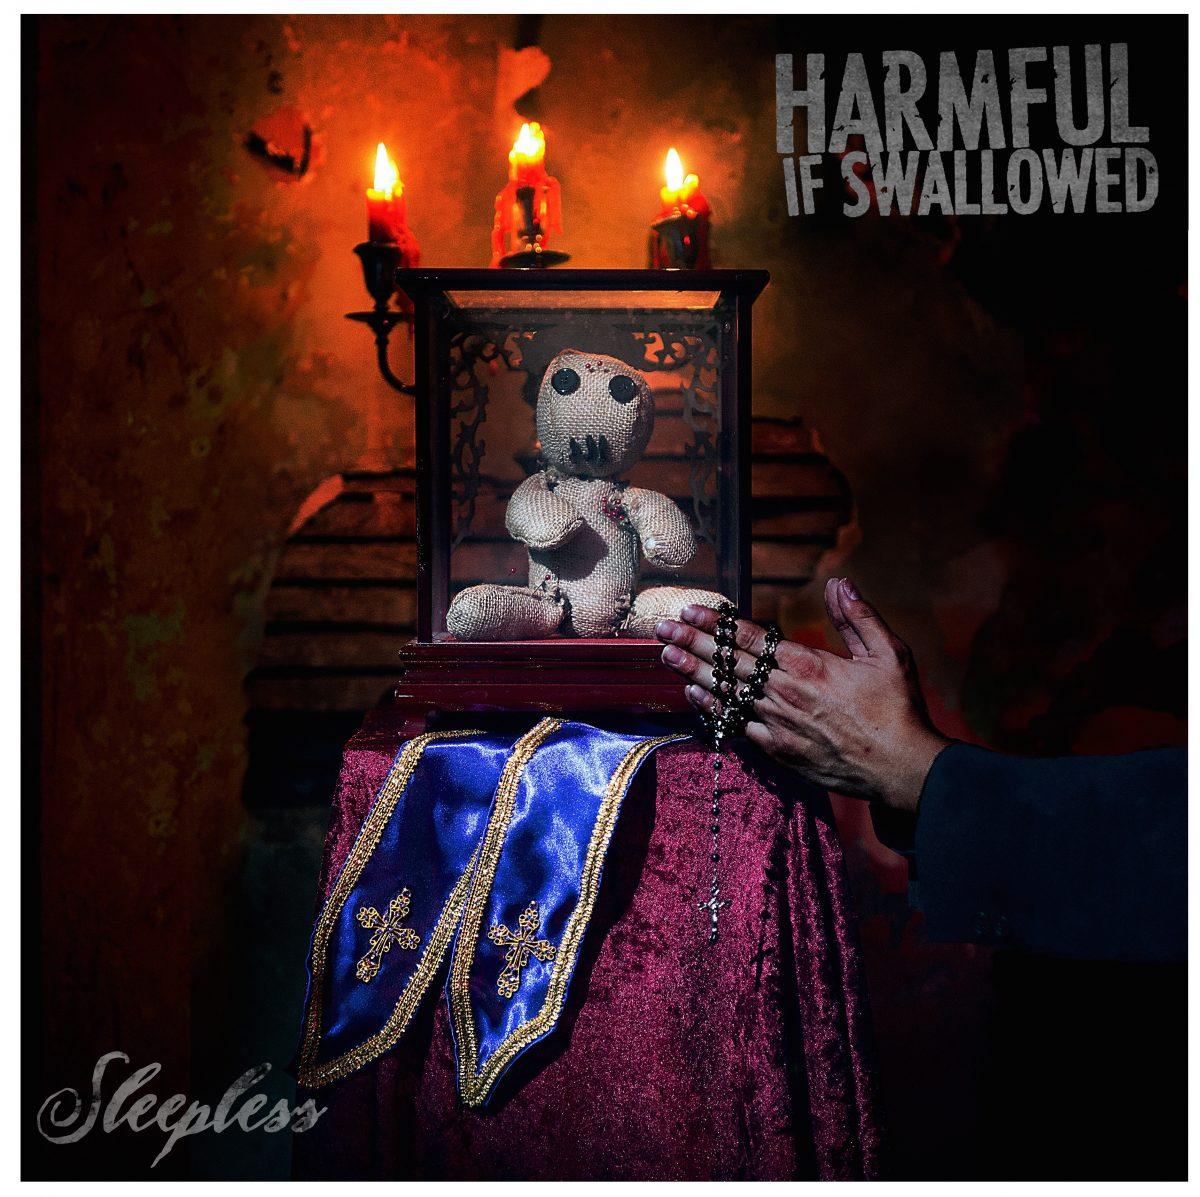 Harmful If Swallowed – Sleepless